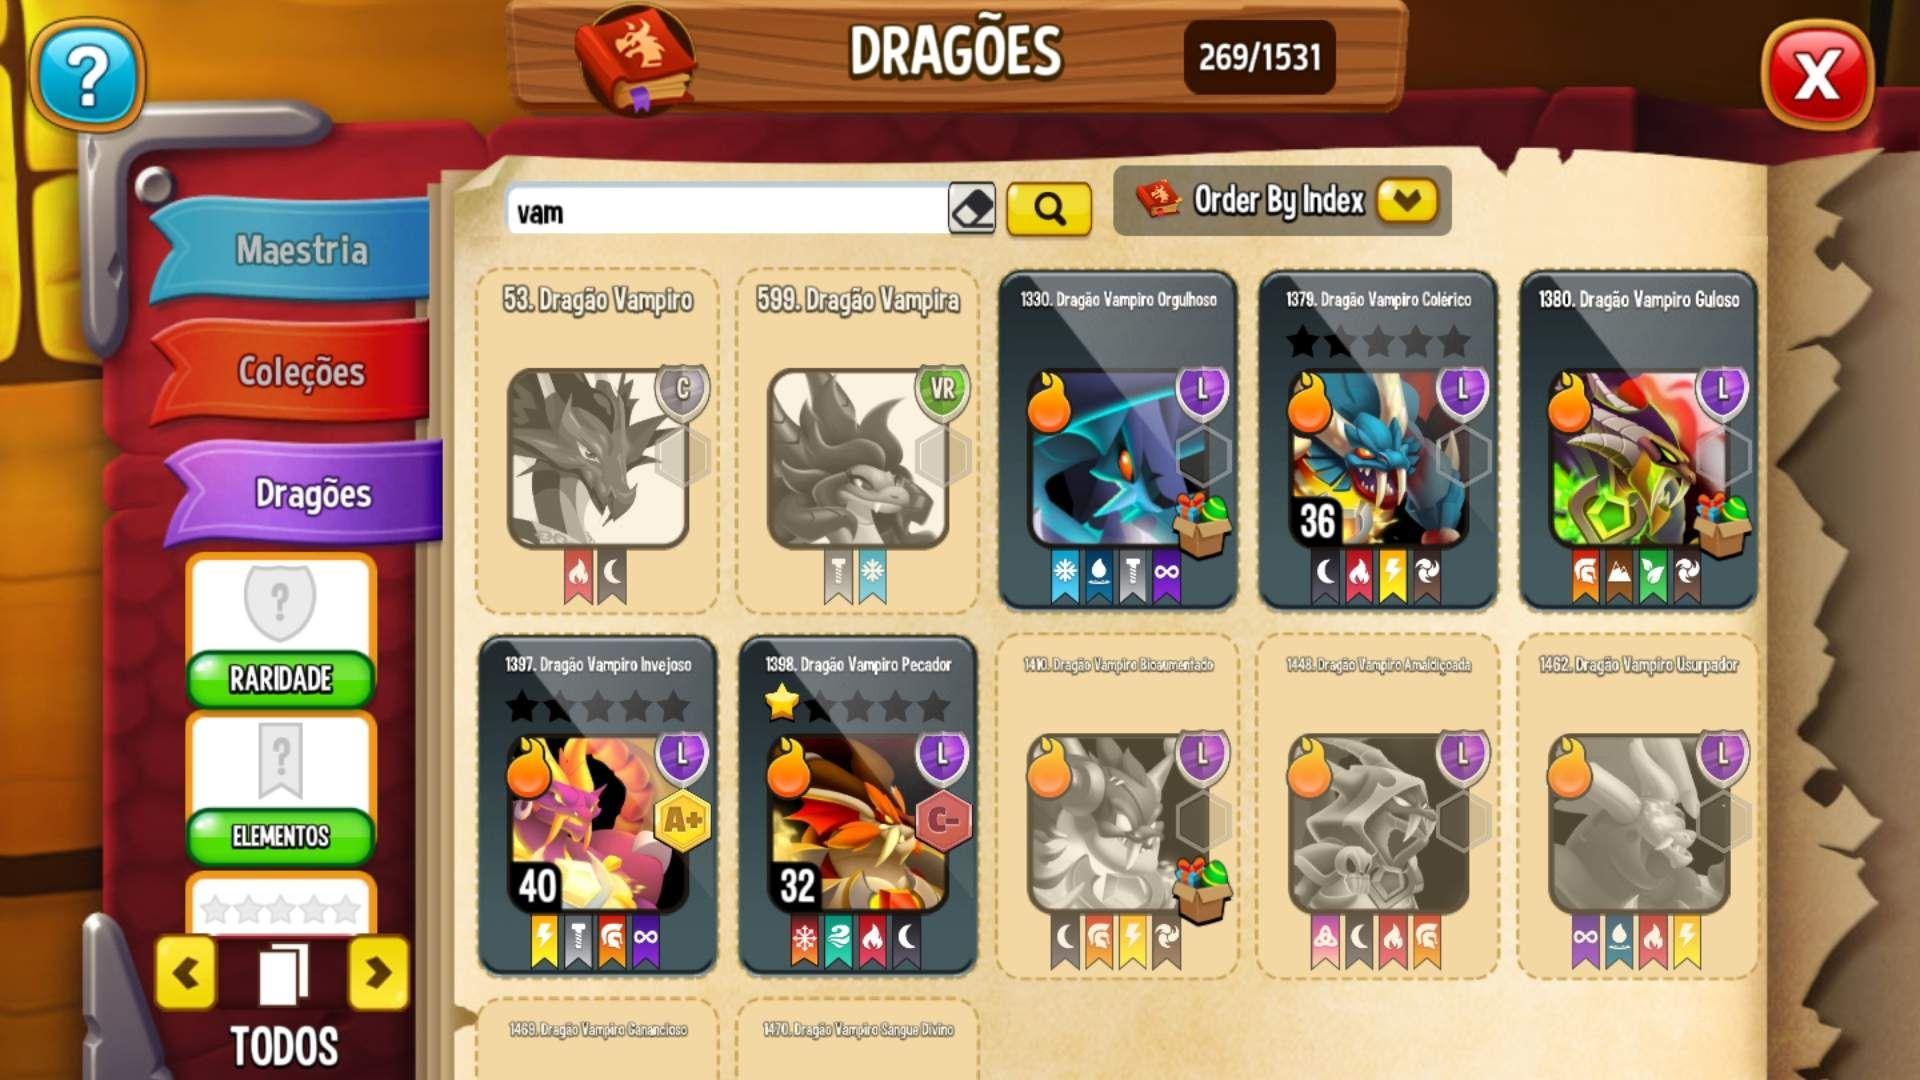 0_1623678440202_Screenshot_20210614-100404_DragonCity.jpg